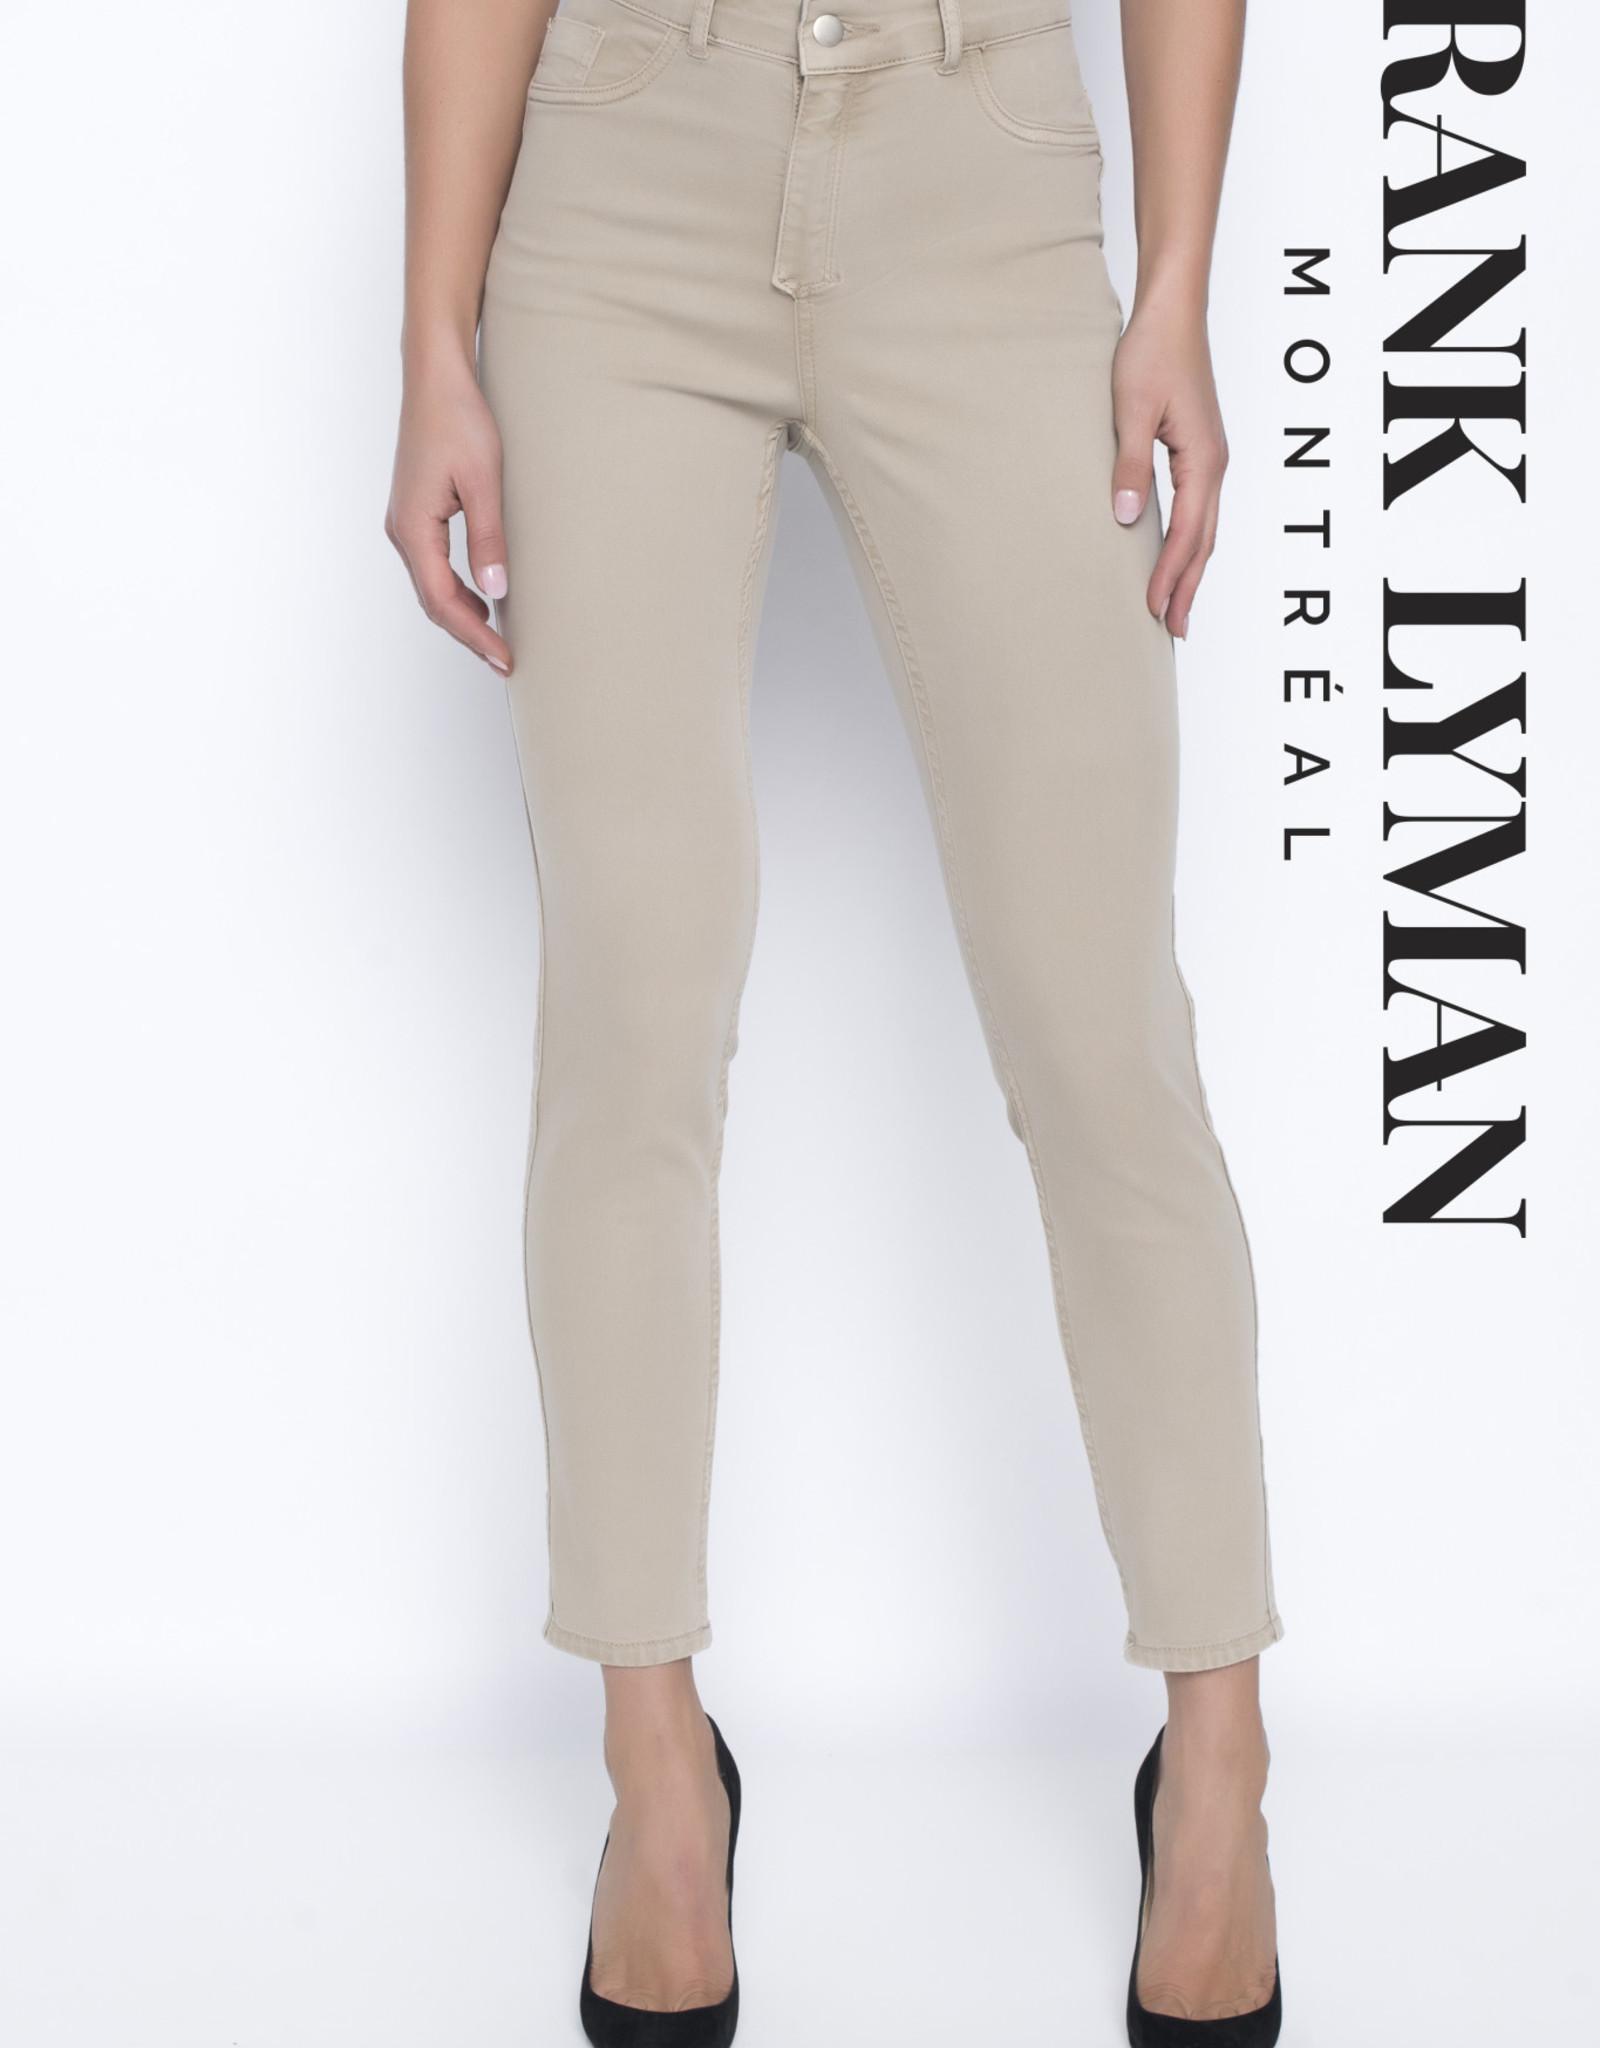 Frank Lyman Frank Lyman Reversible Leopard Jeans